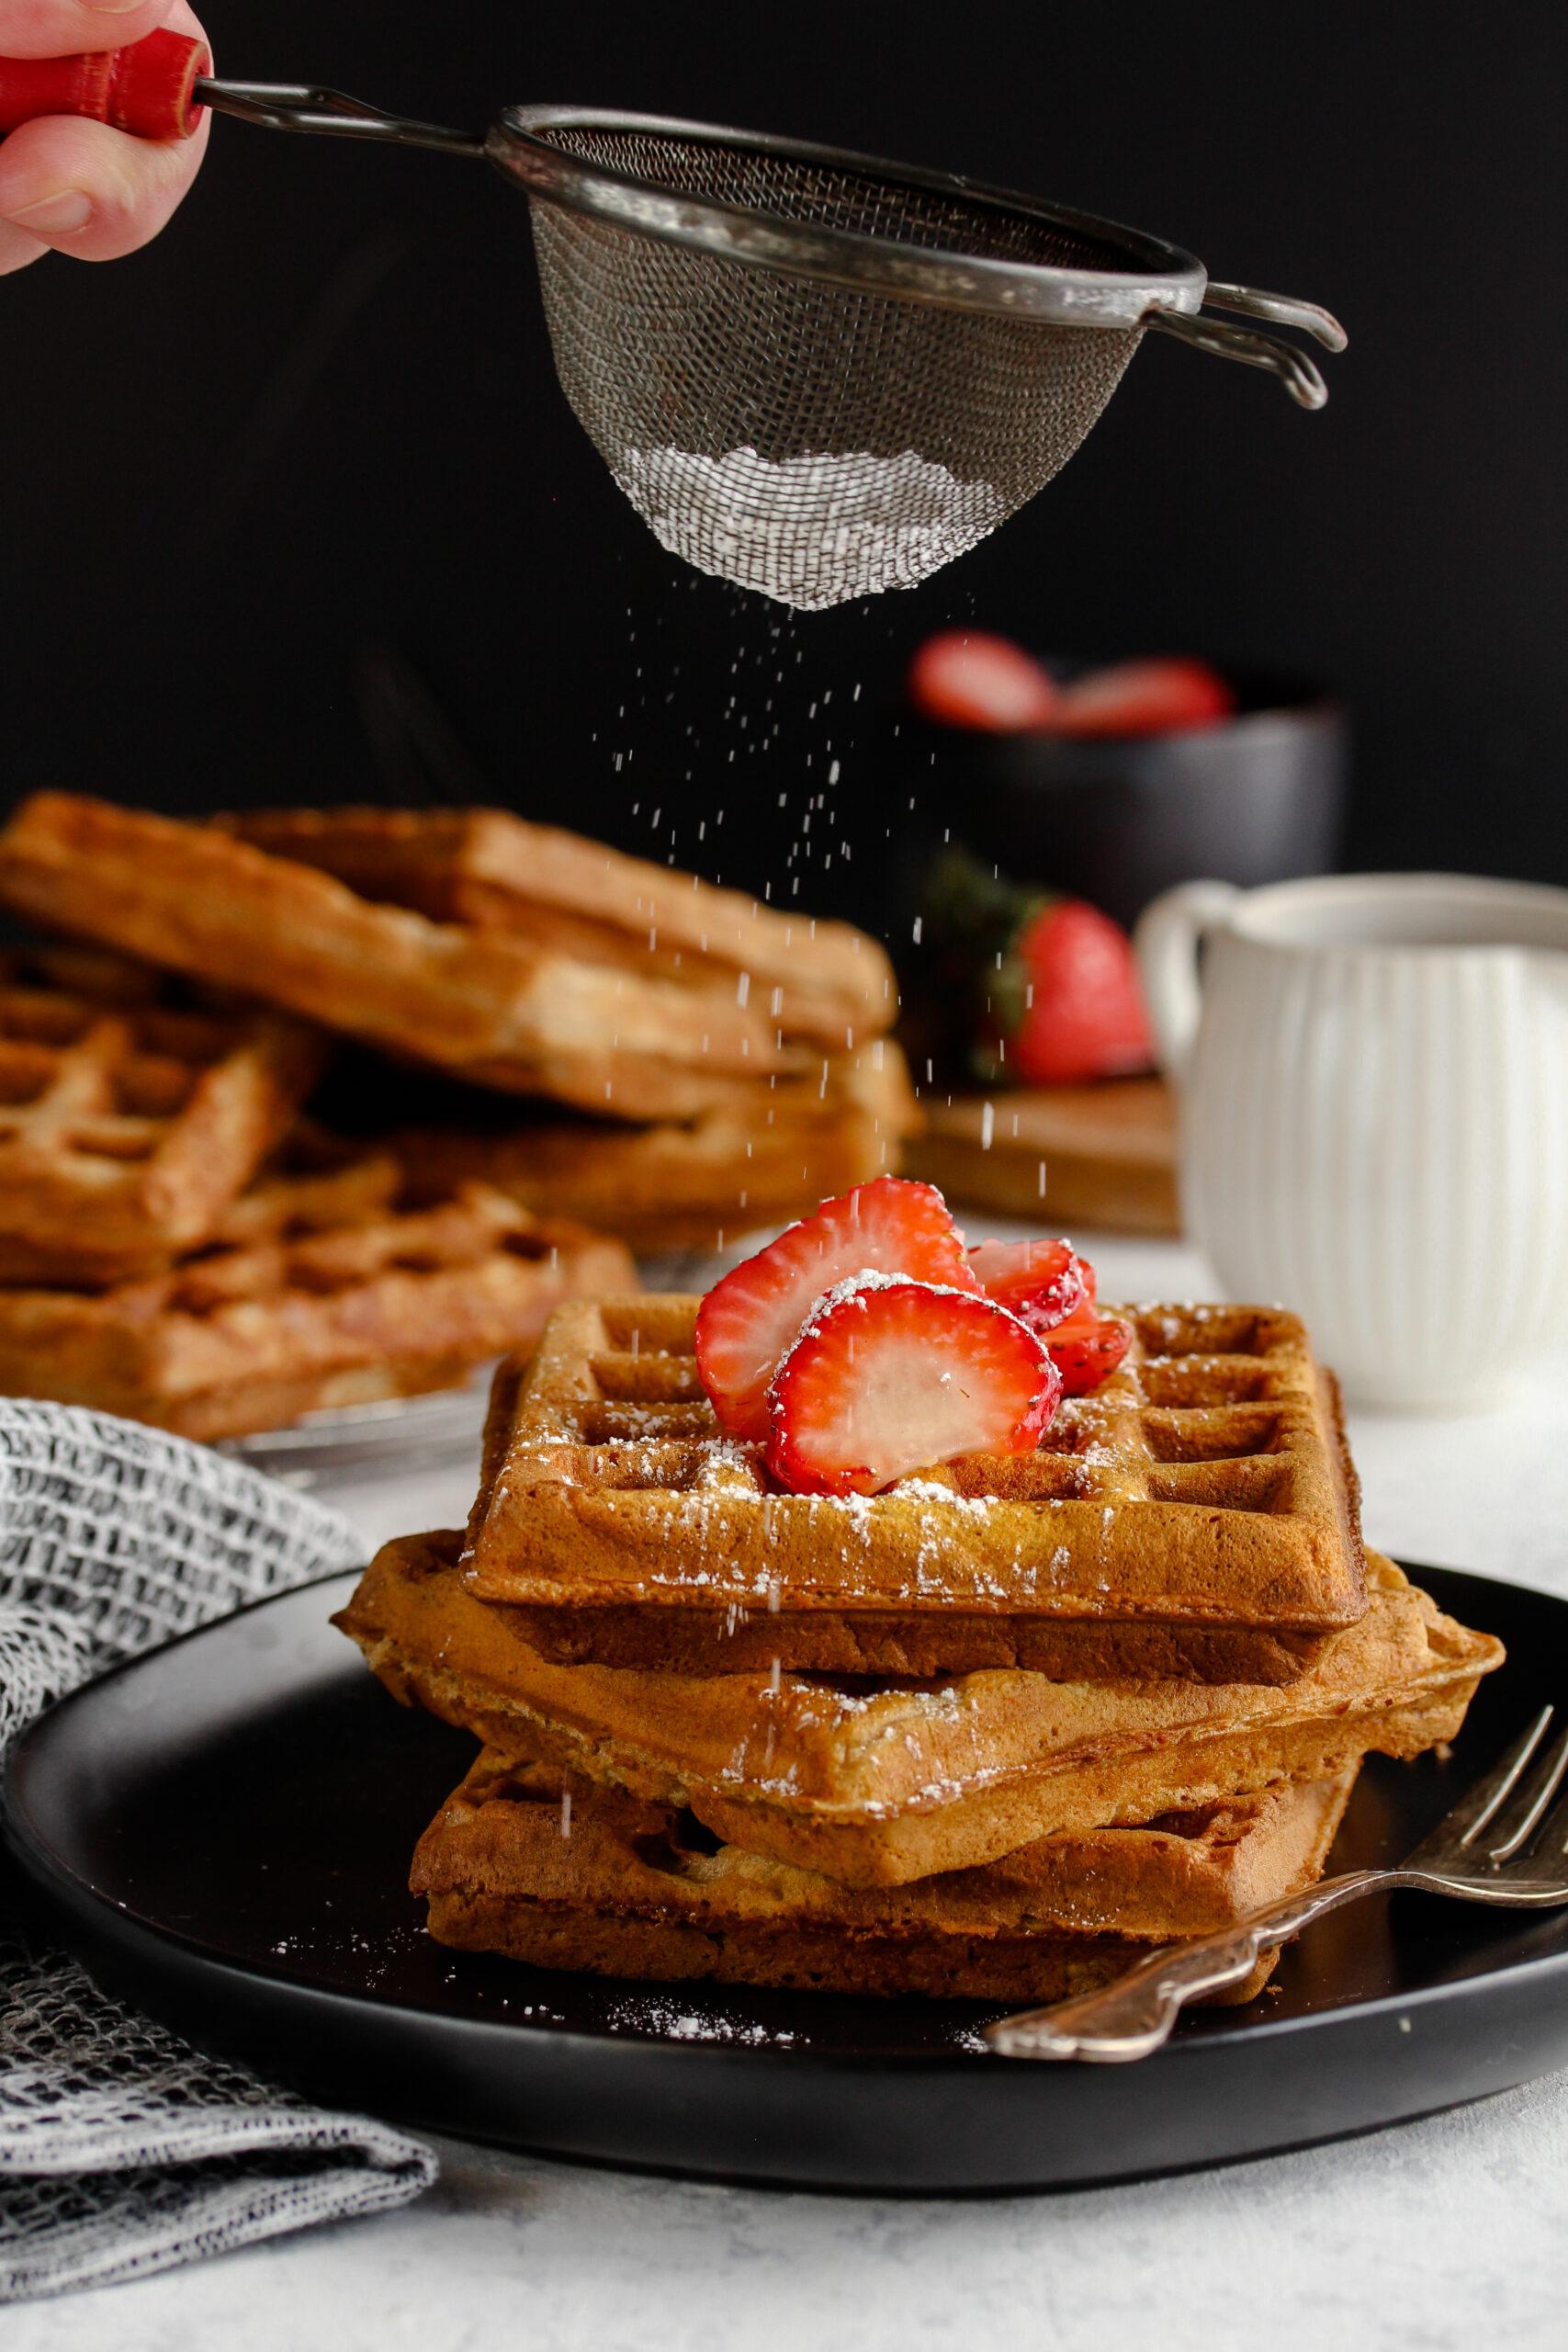 Buttermilk Whole Wheat Waffles | sarahaasrdn.com